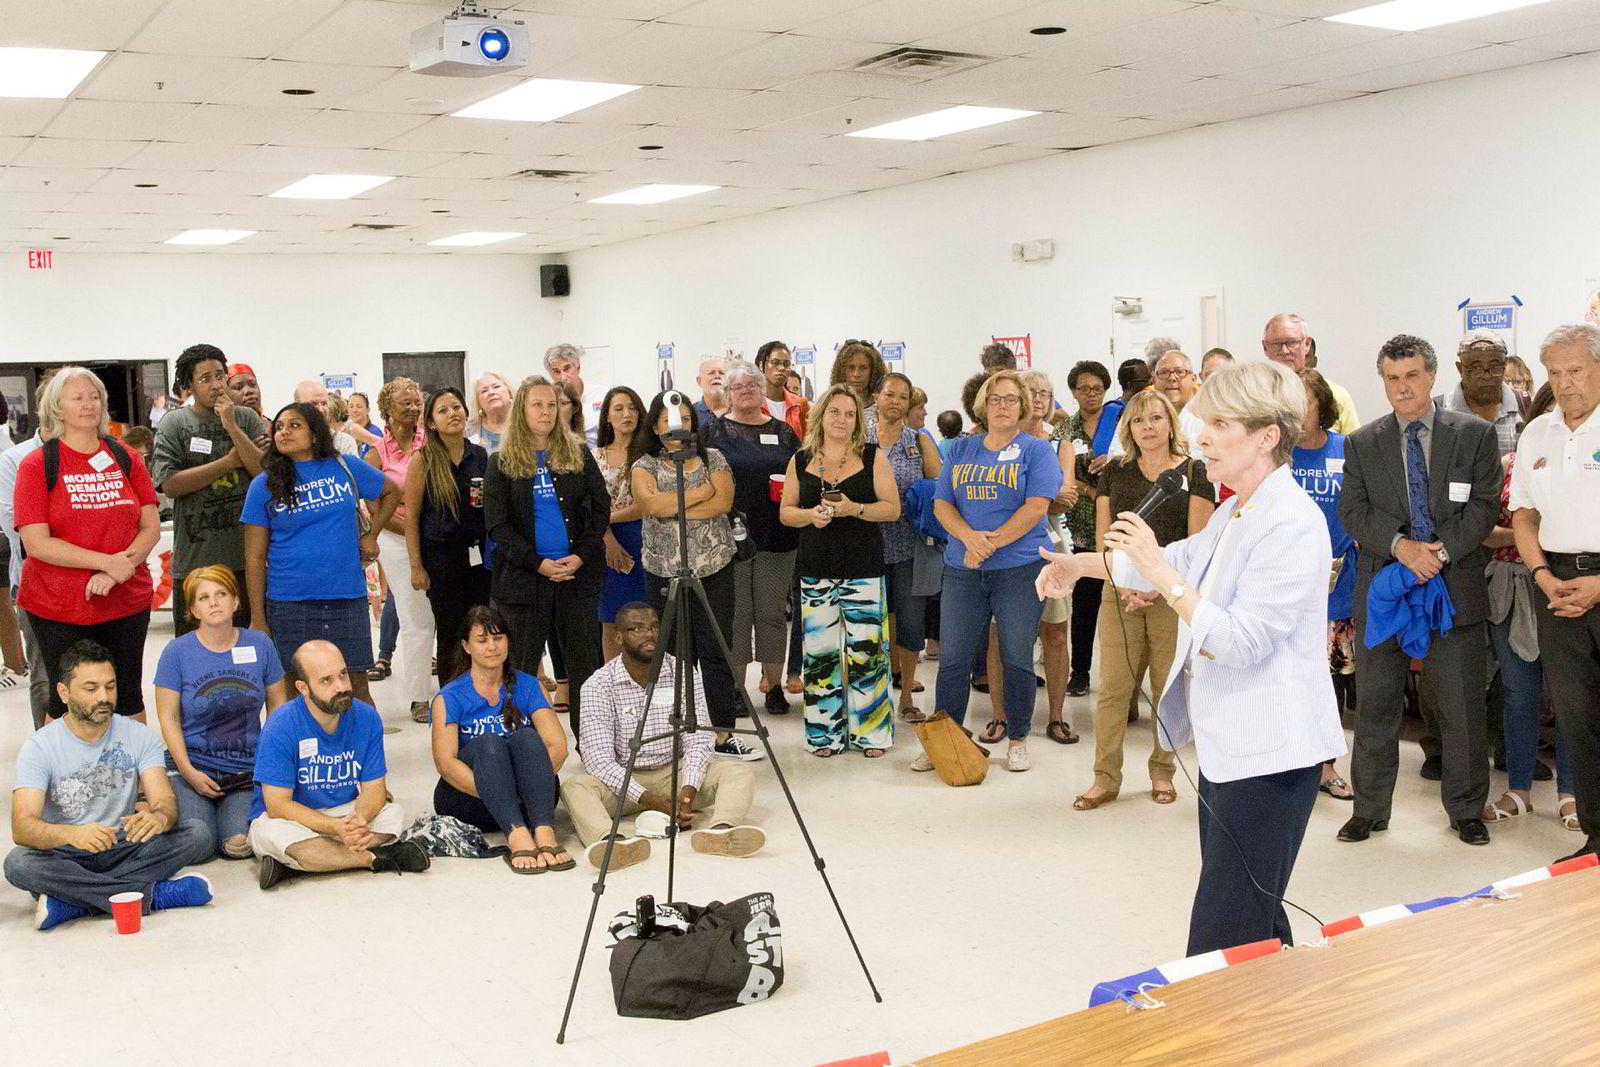 Leder for det Demokratiske parti i Florida, Terriew Rizzo, på valgmøte i West Palm Beach.